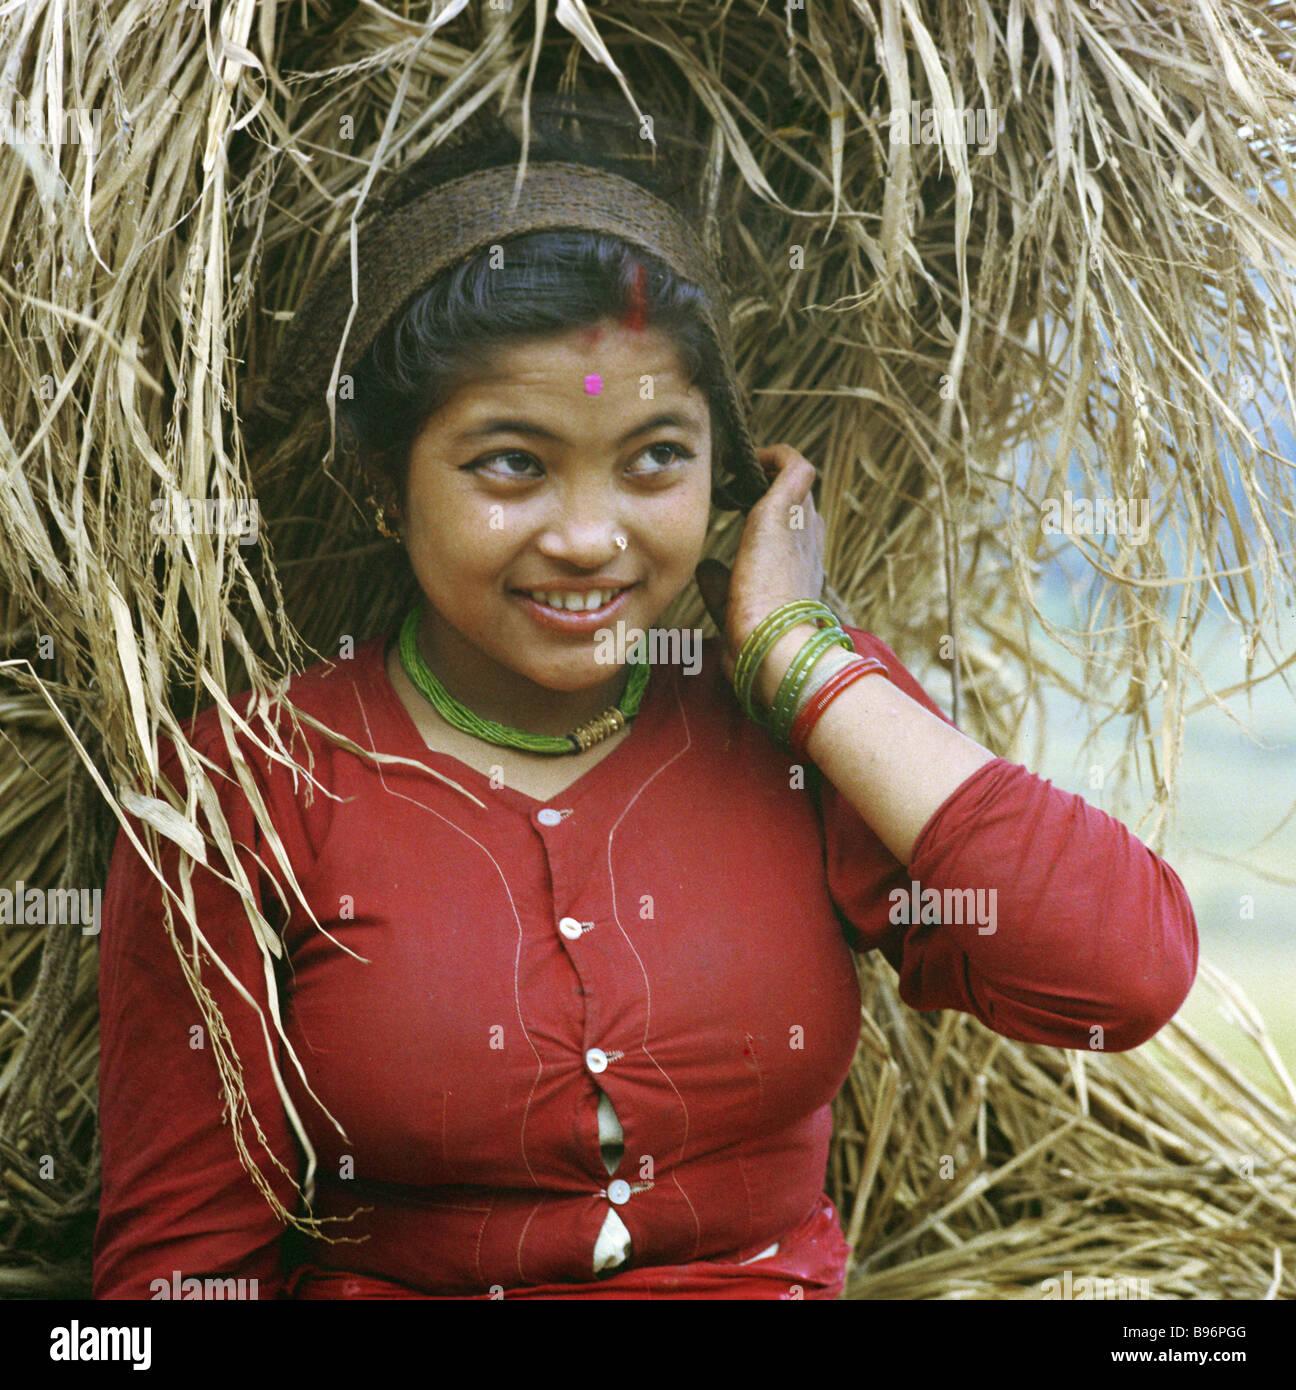 Girl from Katmandu valley - Stock Image